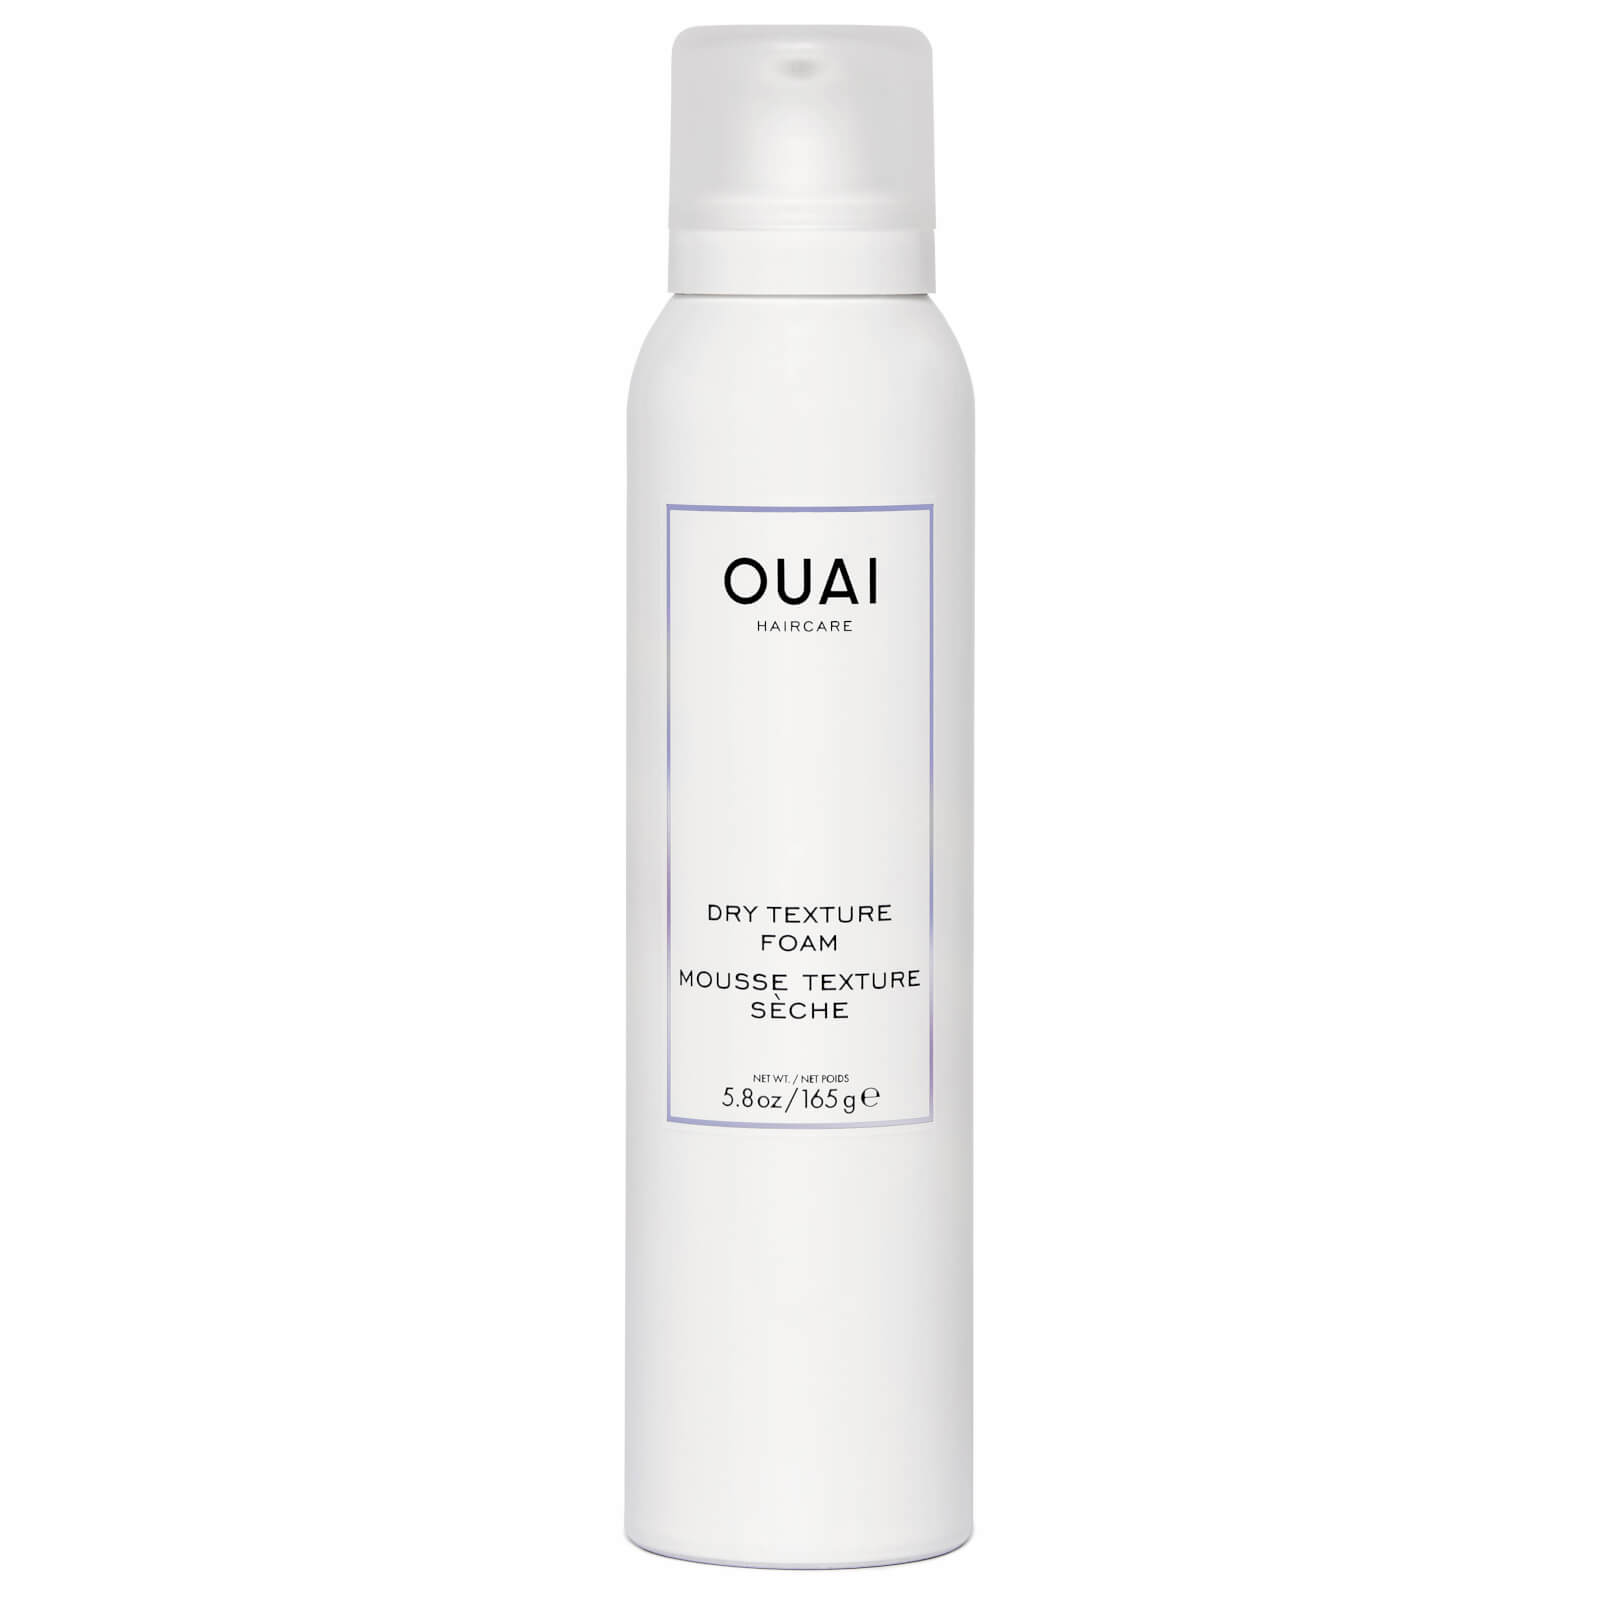 OUAI Dry Texture Foam (165g)